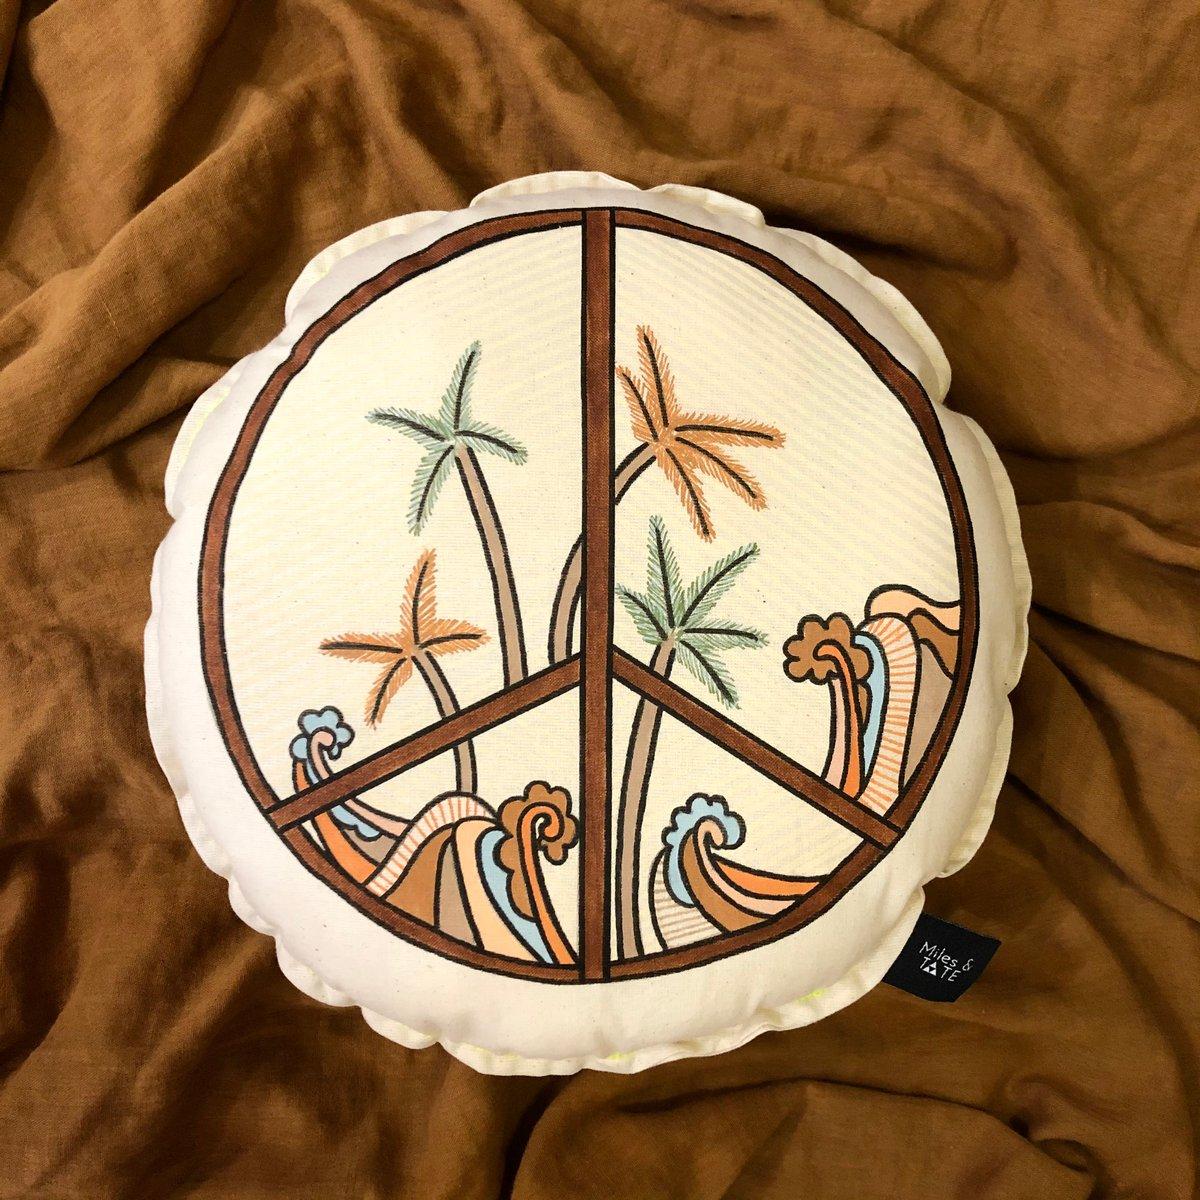 Image of Vintage coastal peace sign cushion